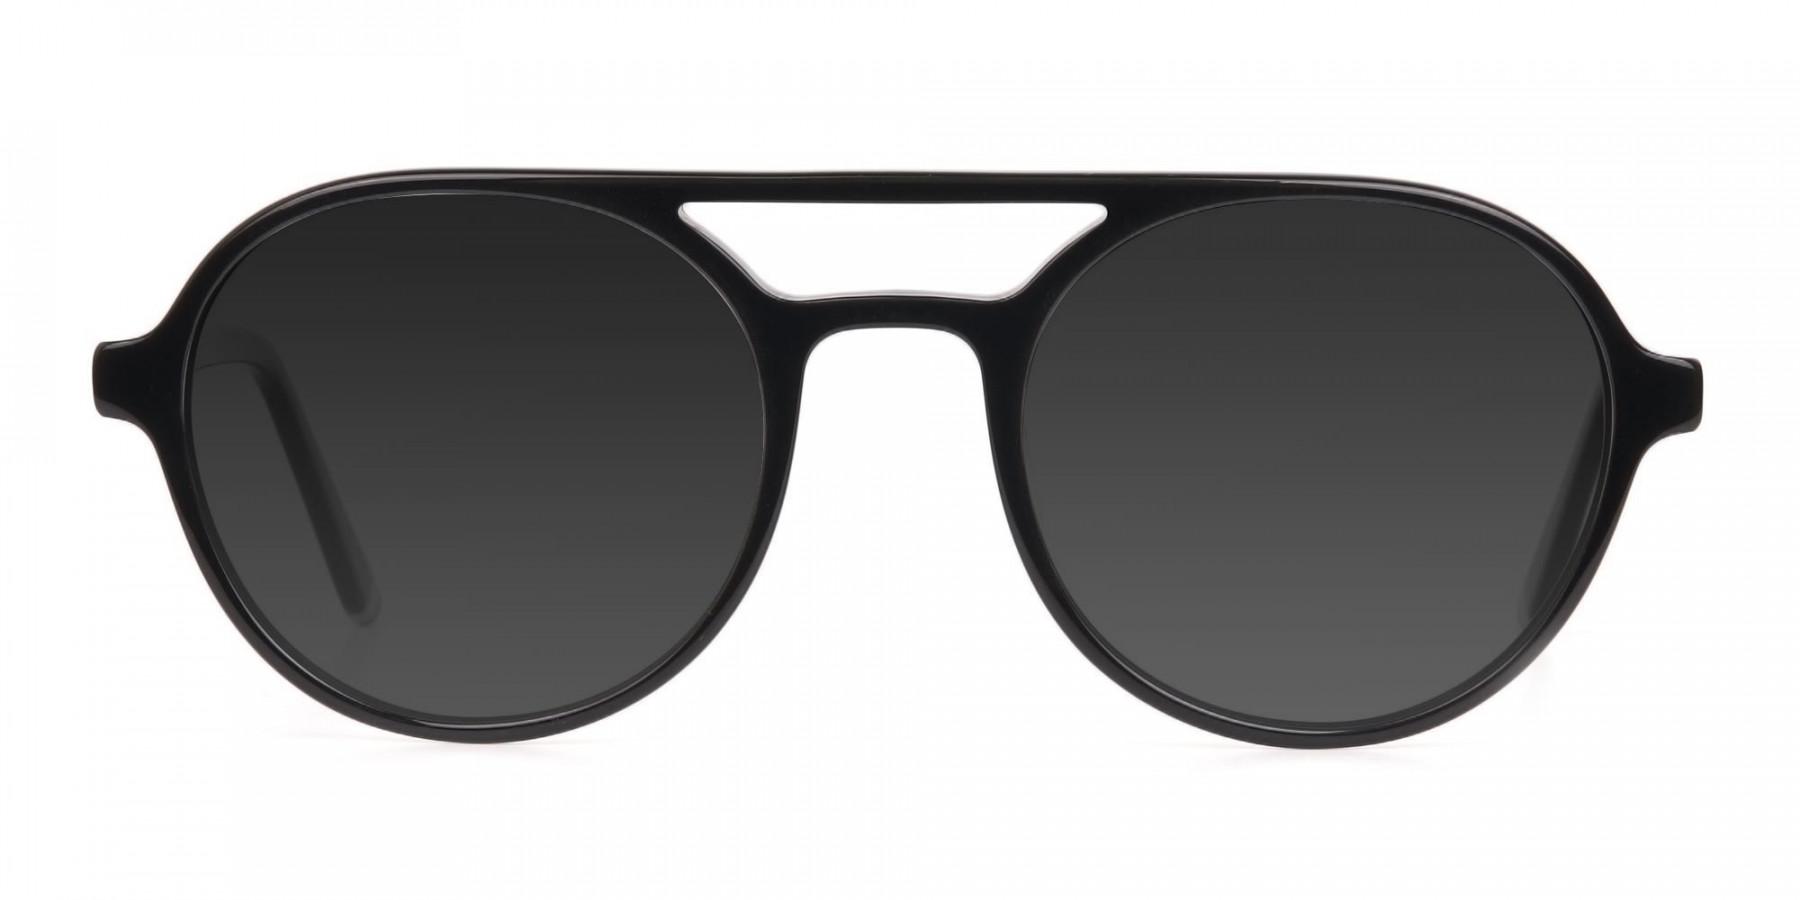 Black Aviator Sunglasses with Dark Grey Lenses - 3